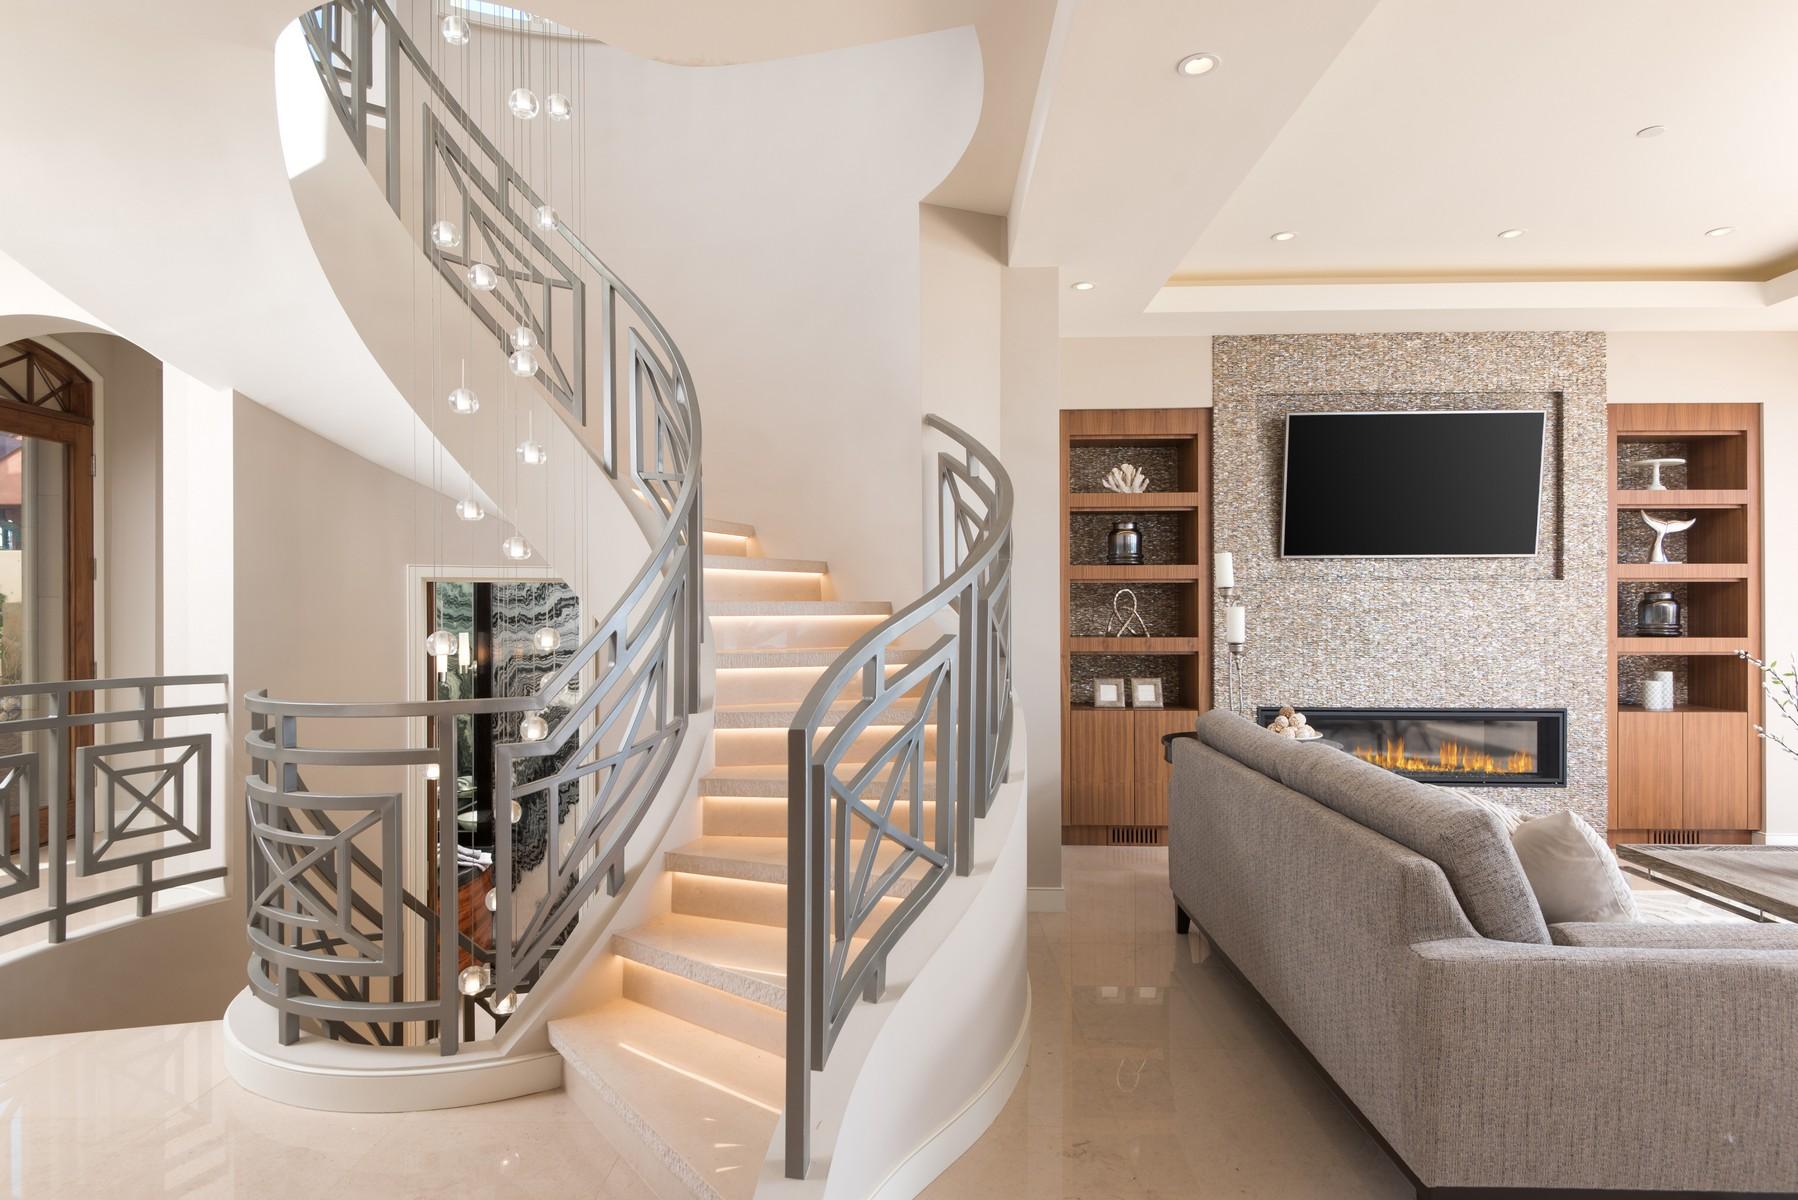 Additional photo for property listing at 824 Neptune Avenue  Encinitas, Californie 92024 États-Unis